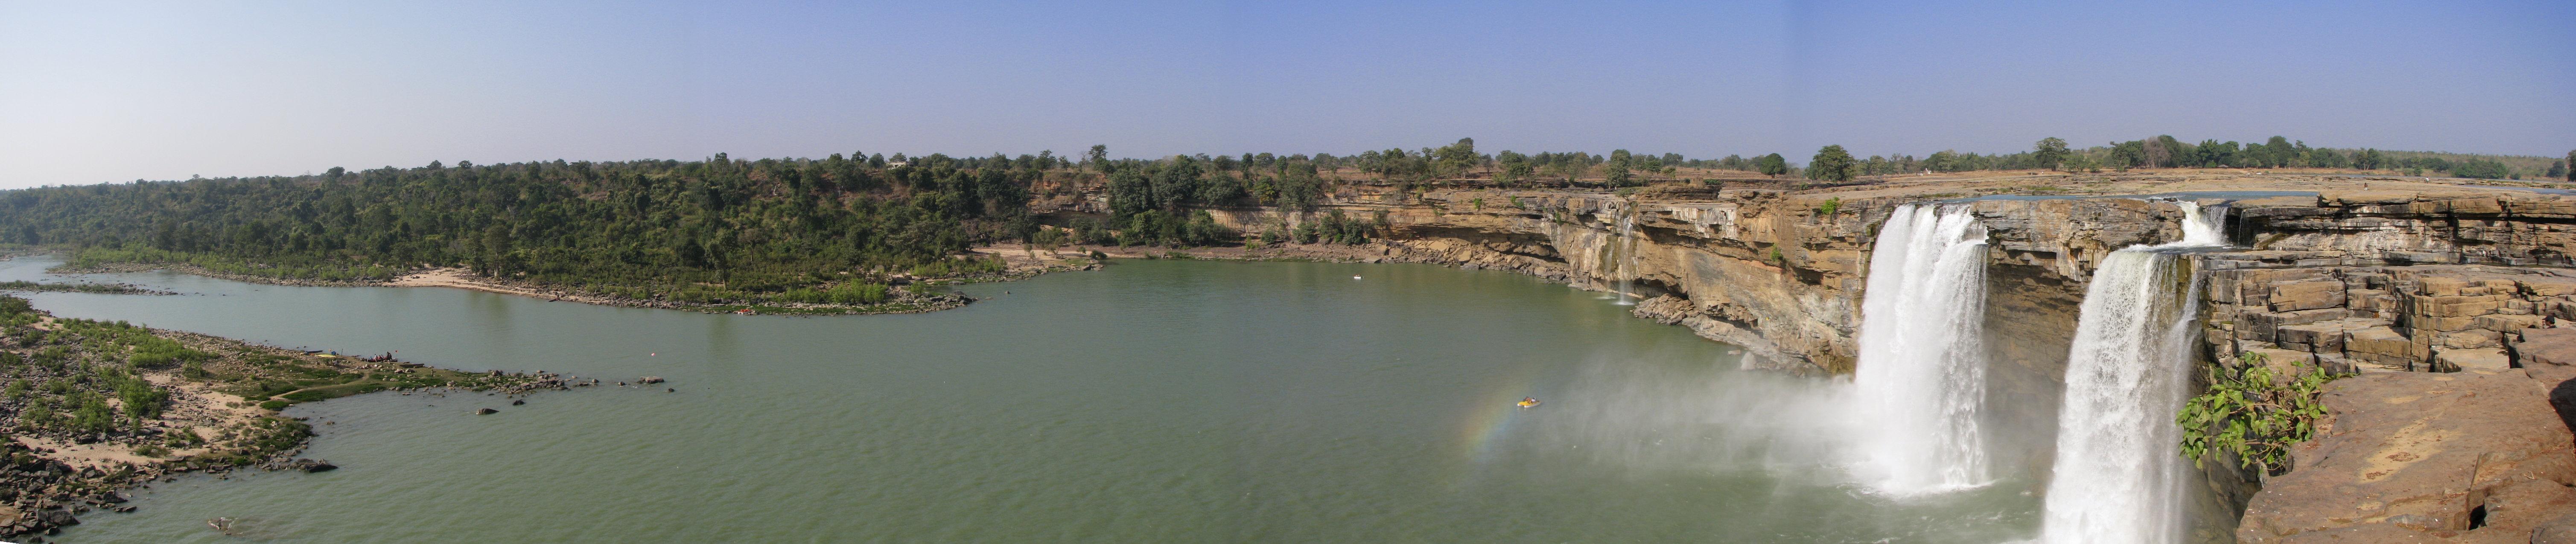 Panoramic view of Chitrakoot in December